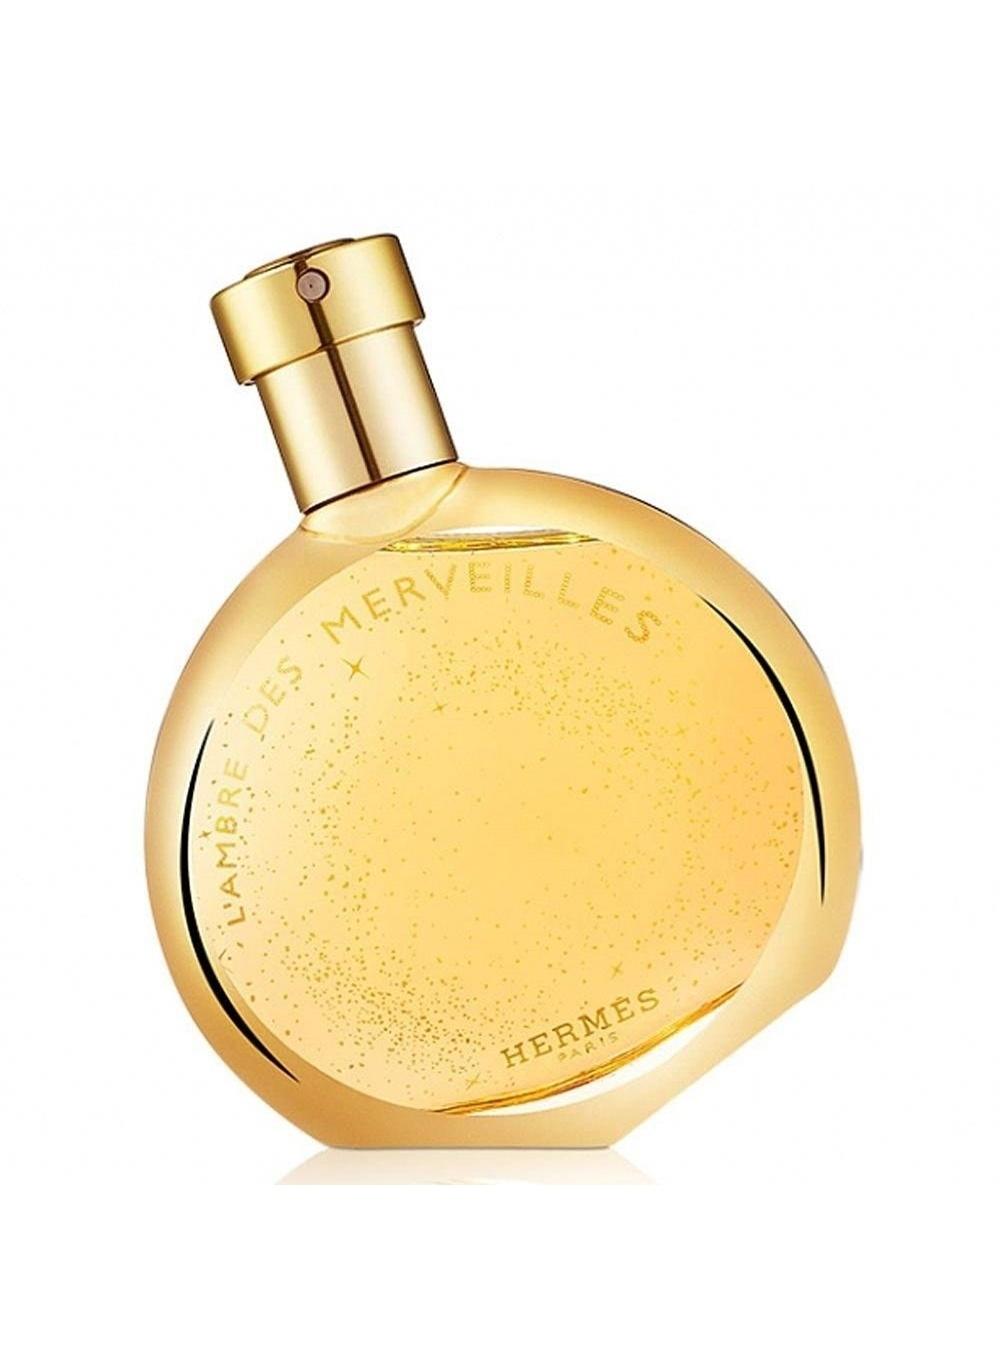 Kadın Hermes L\'Ambre Des Merveilles Edp 50 Ml Parfüm